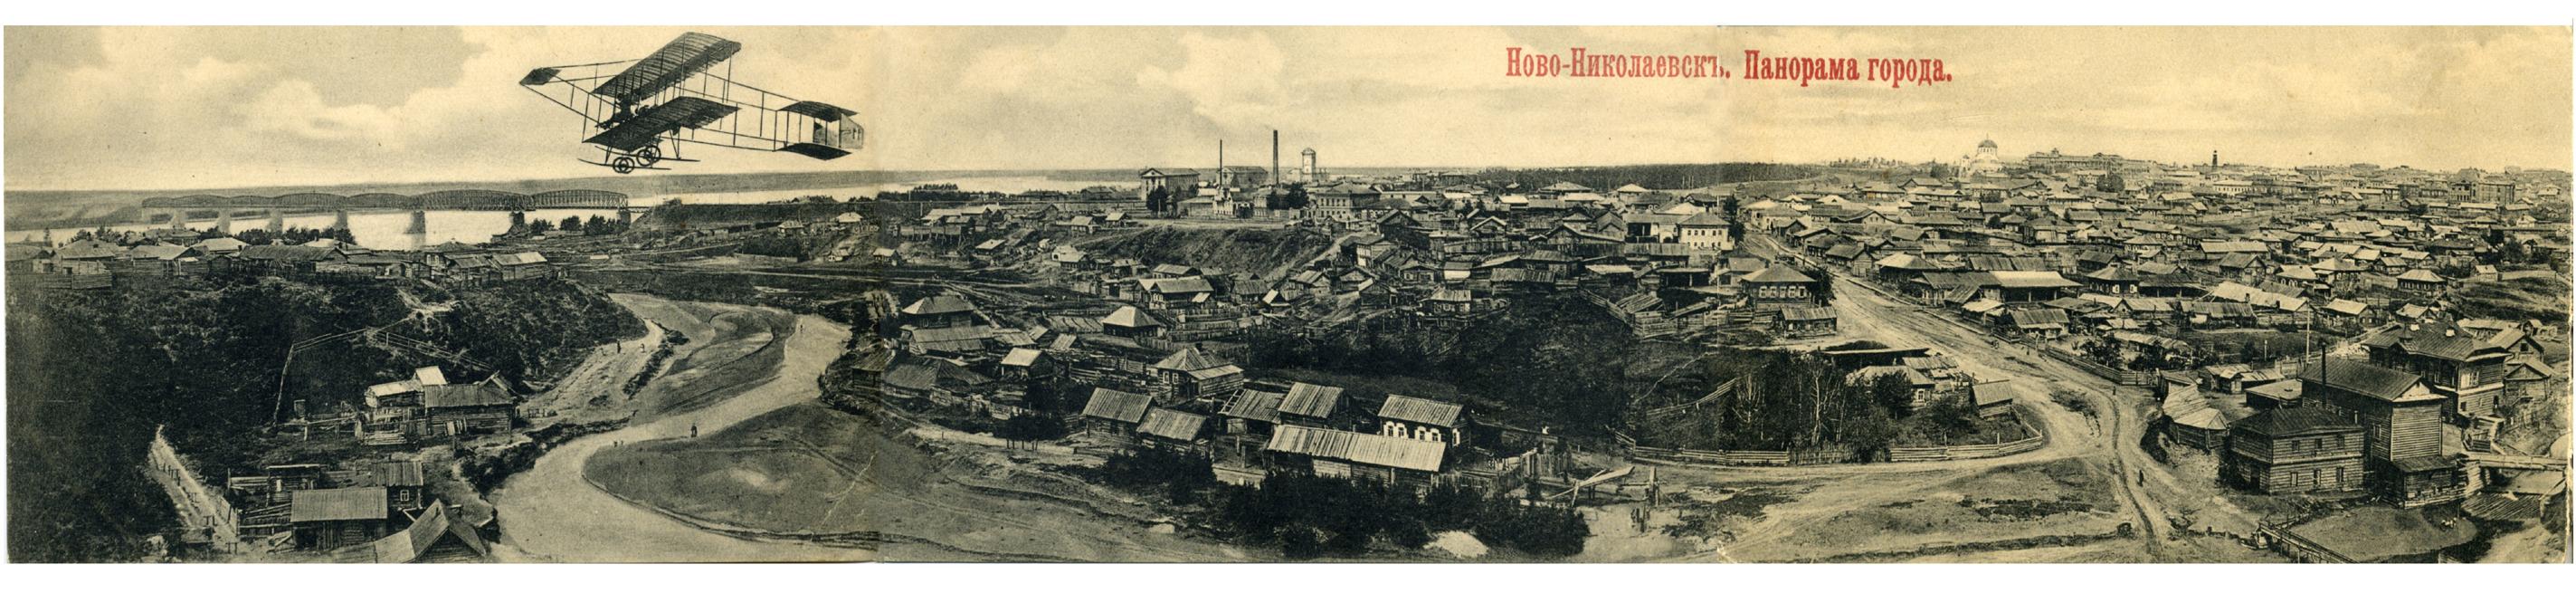 Панорама города, 17 апреля 1917 года